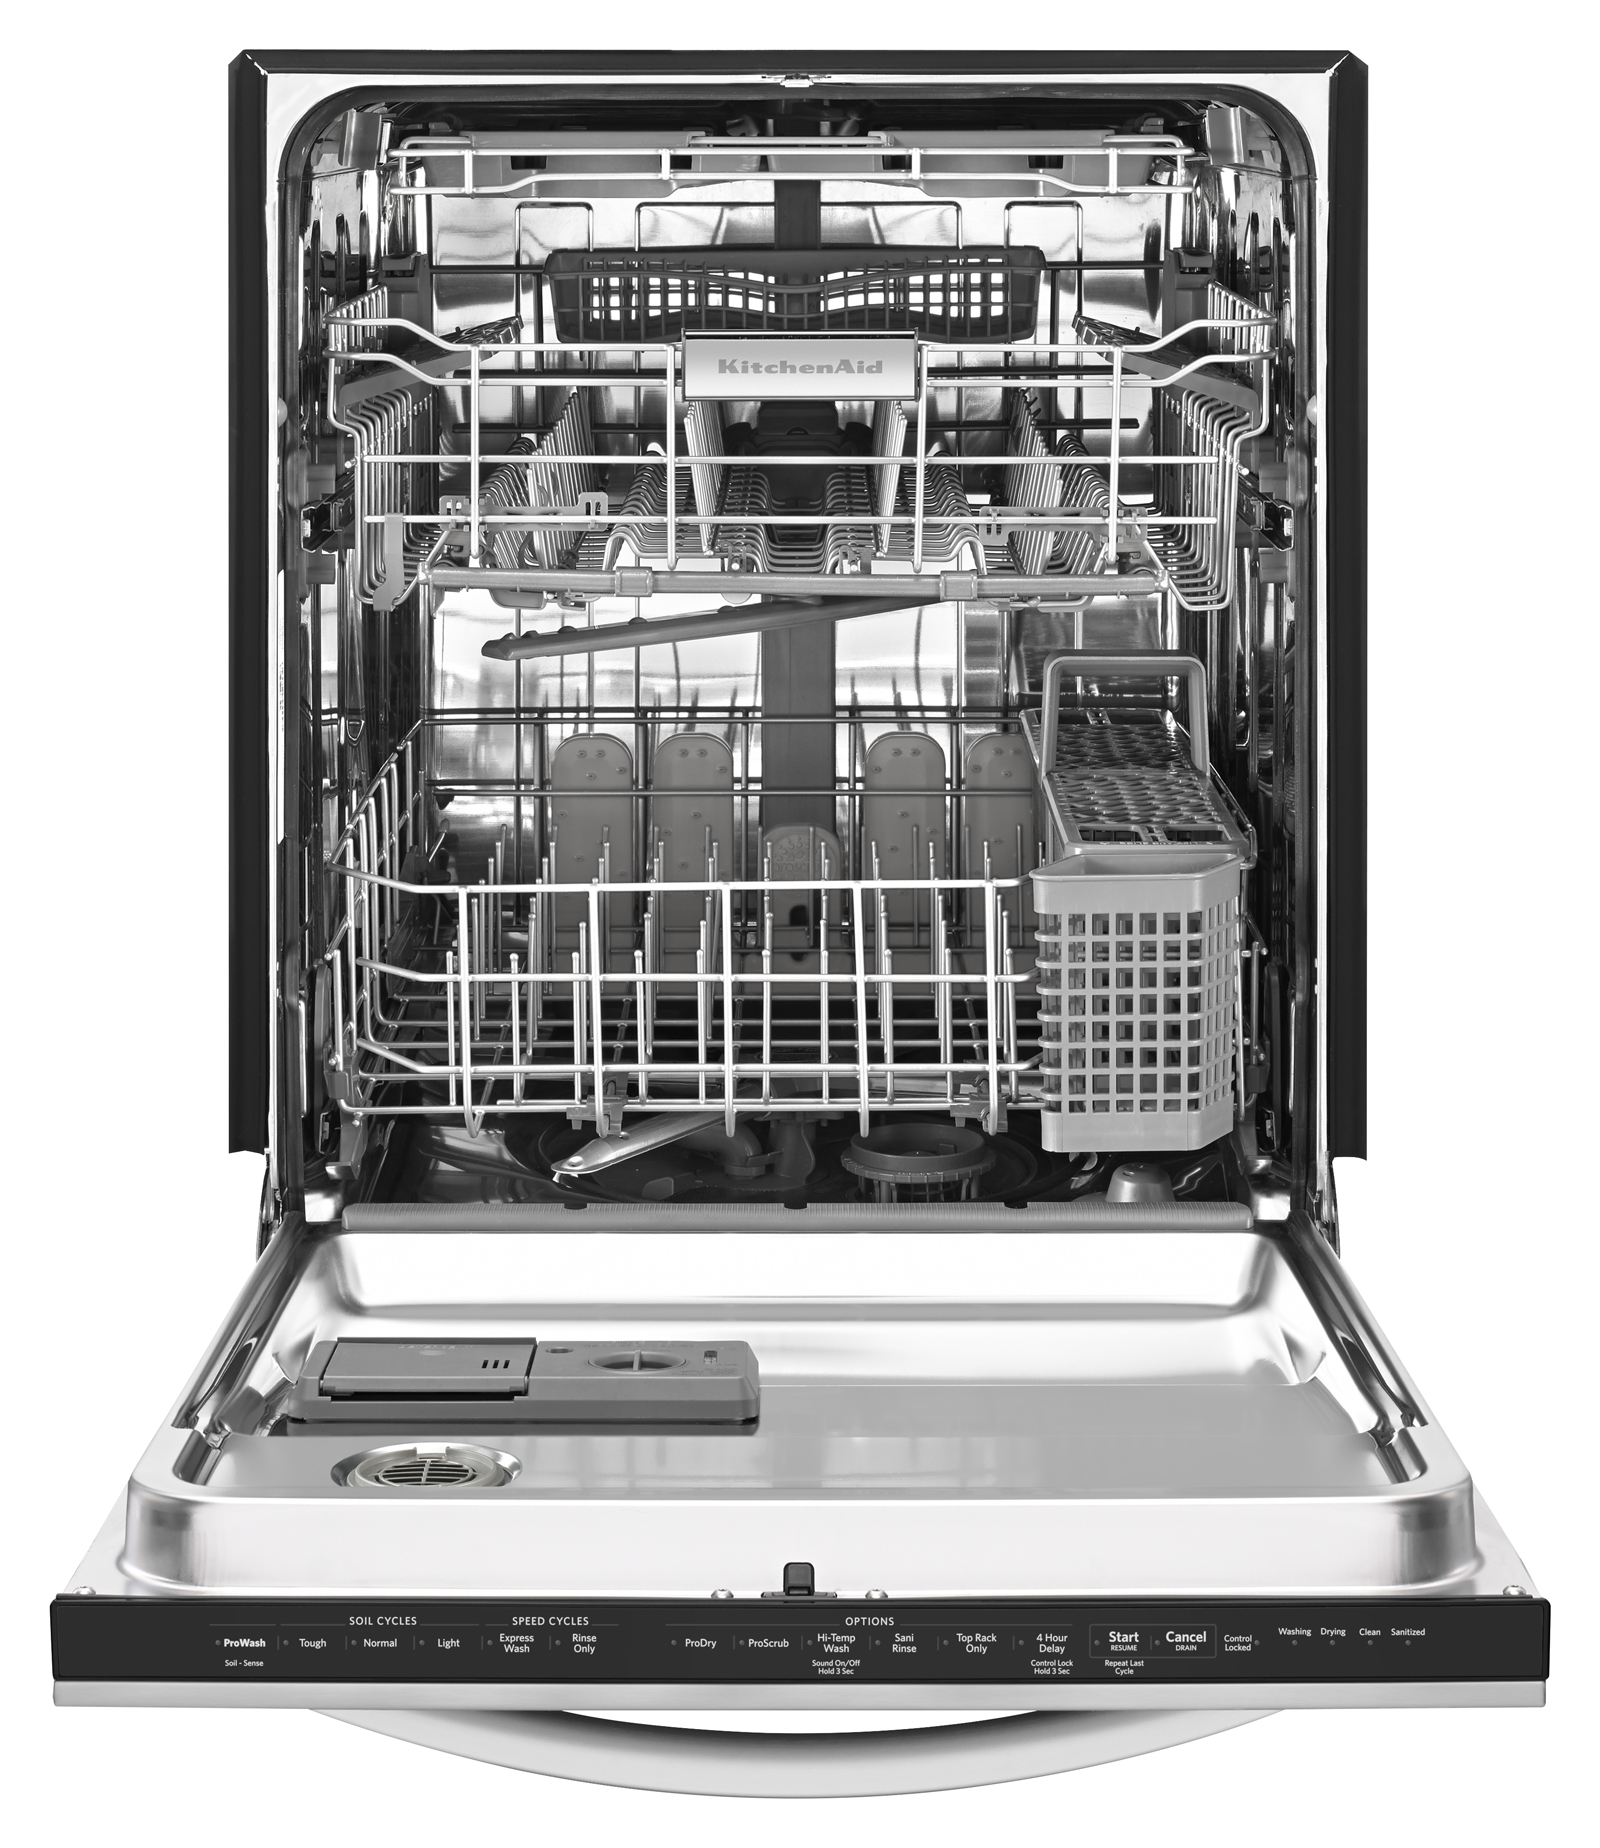 KitchenAid 24-in. Built-in Dishwasher w/ ProScrub® Trio and Third Rack - Black